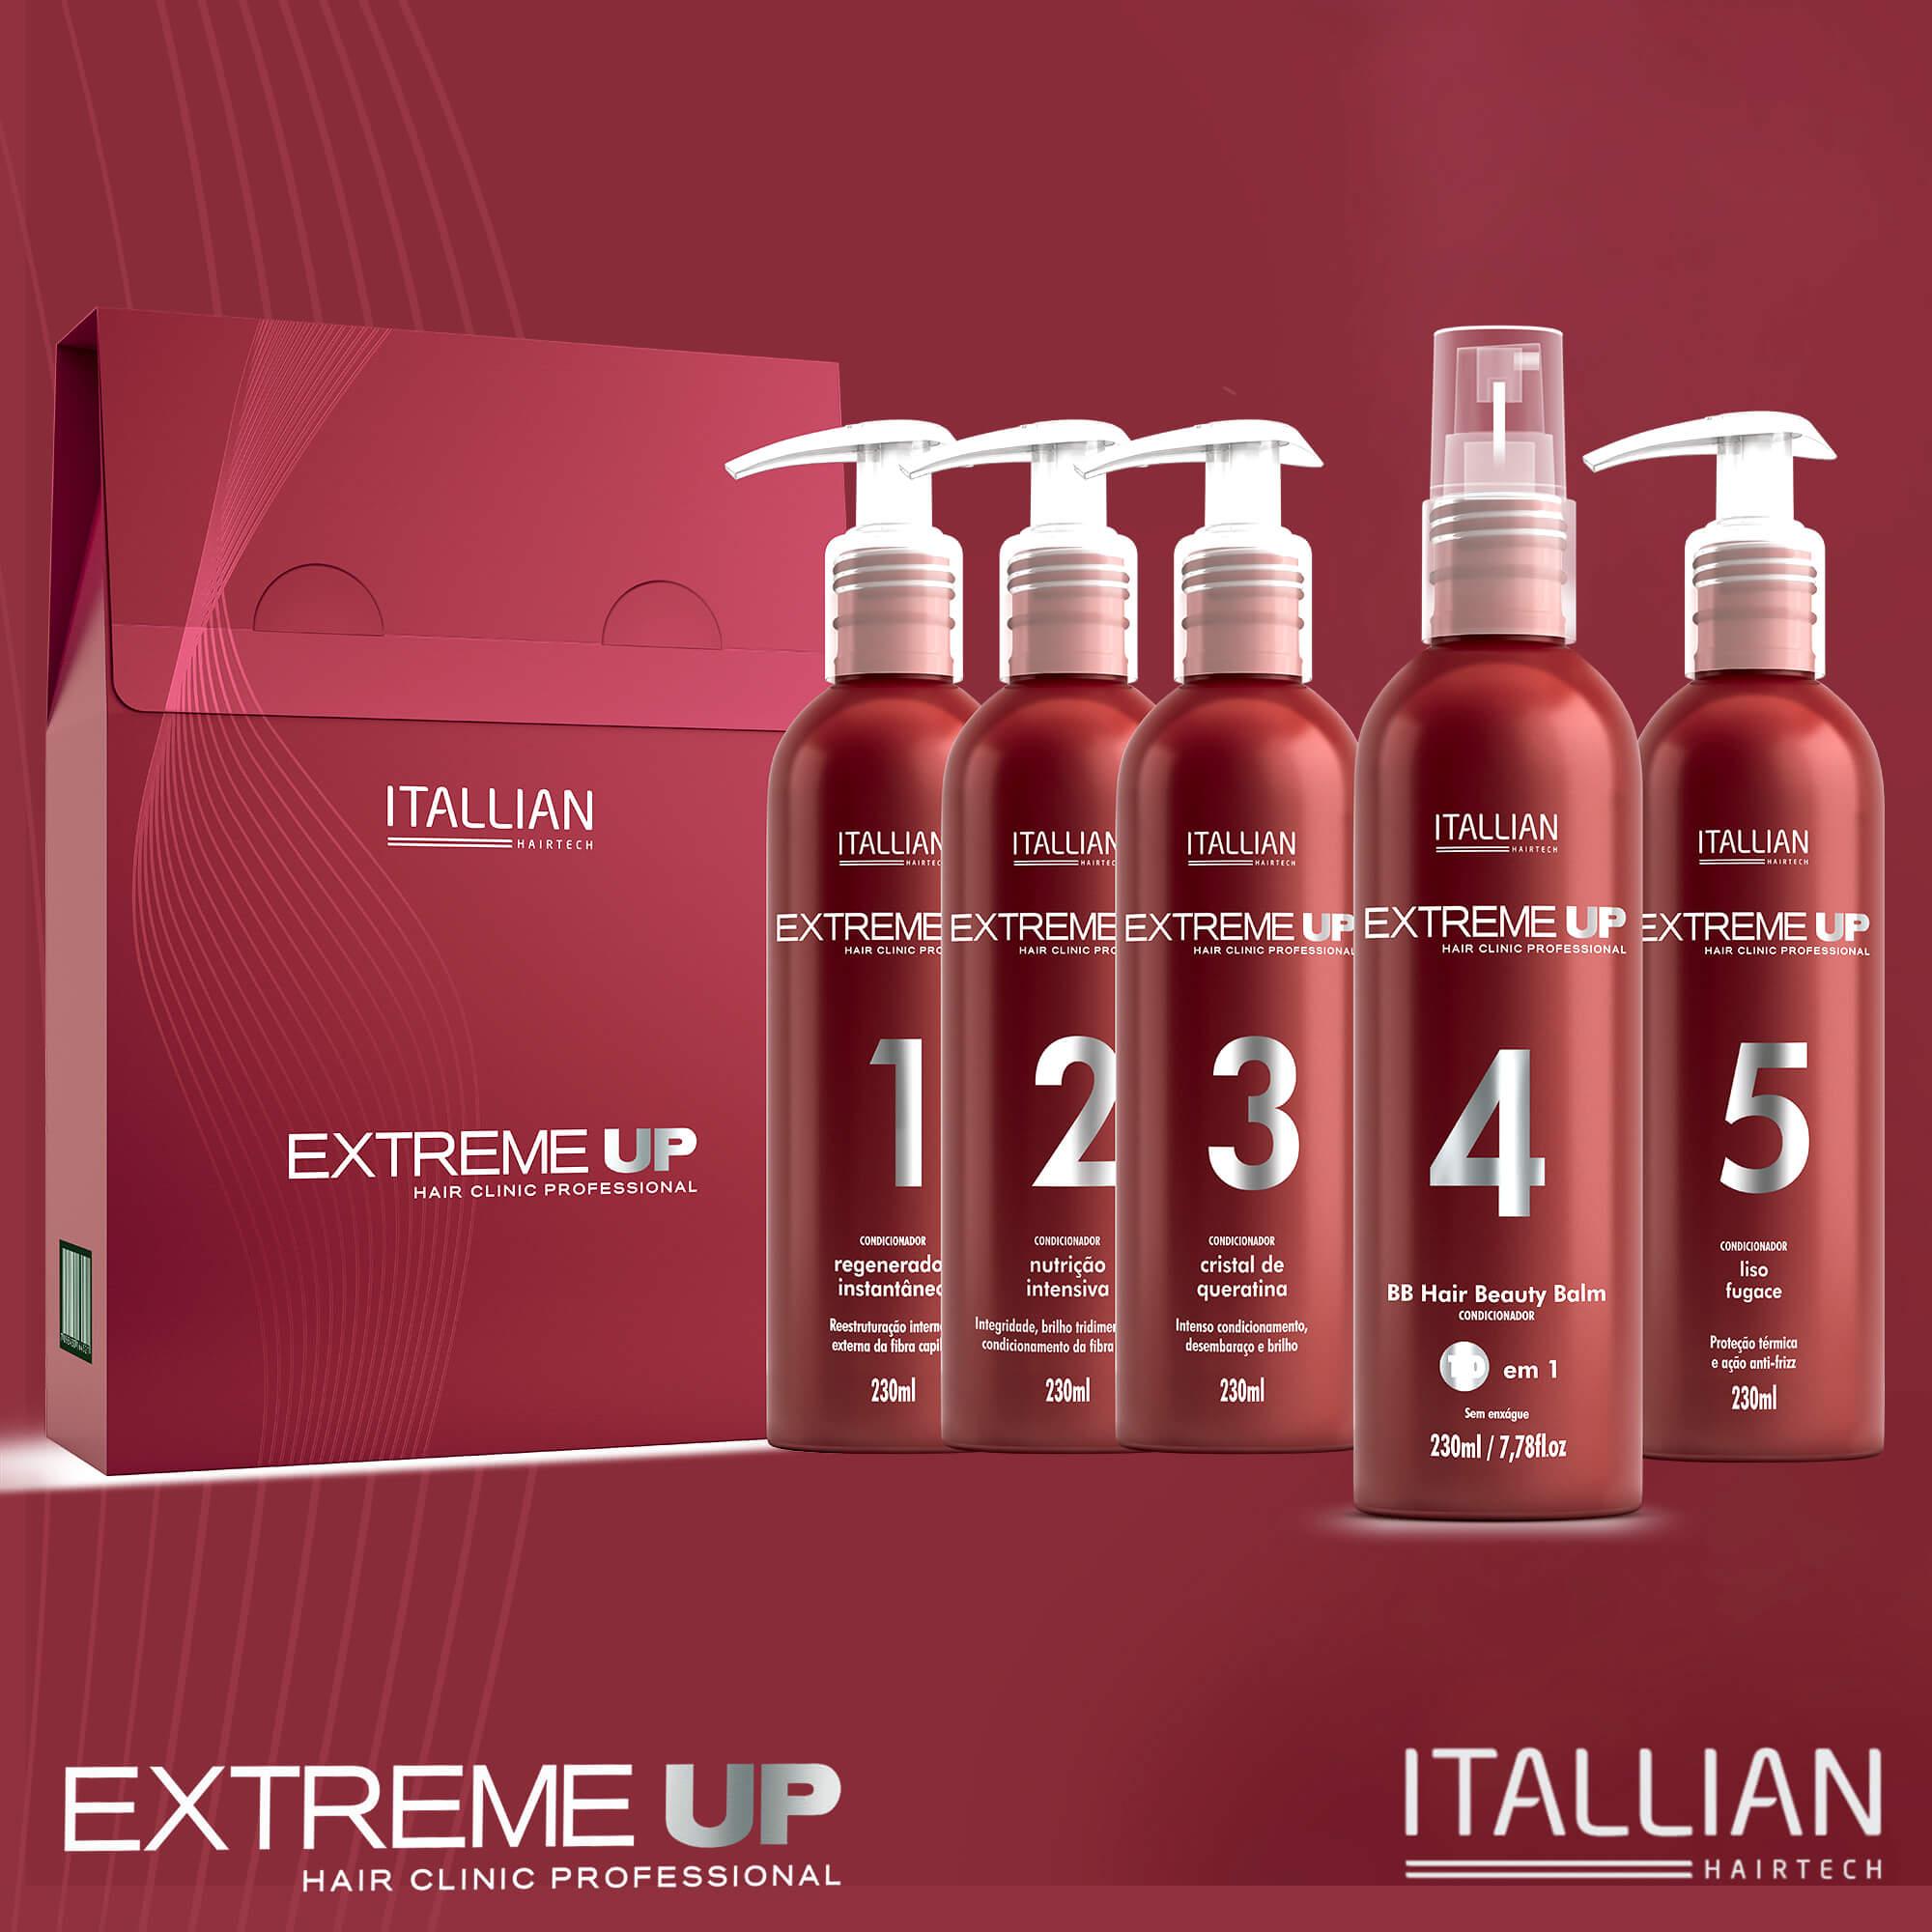 Kit Extreme-up Hair Clinic Itallian Com 5 Itens